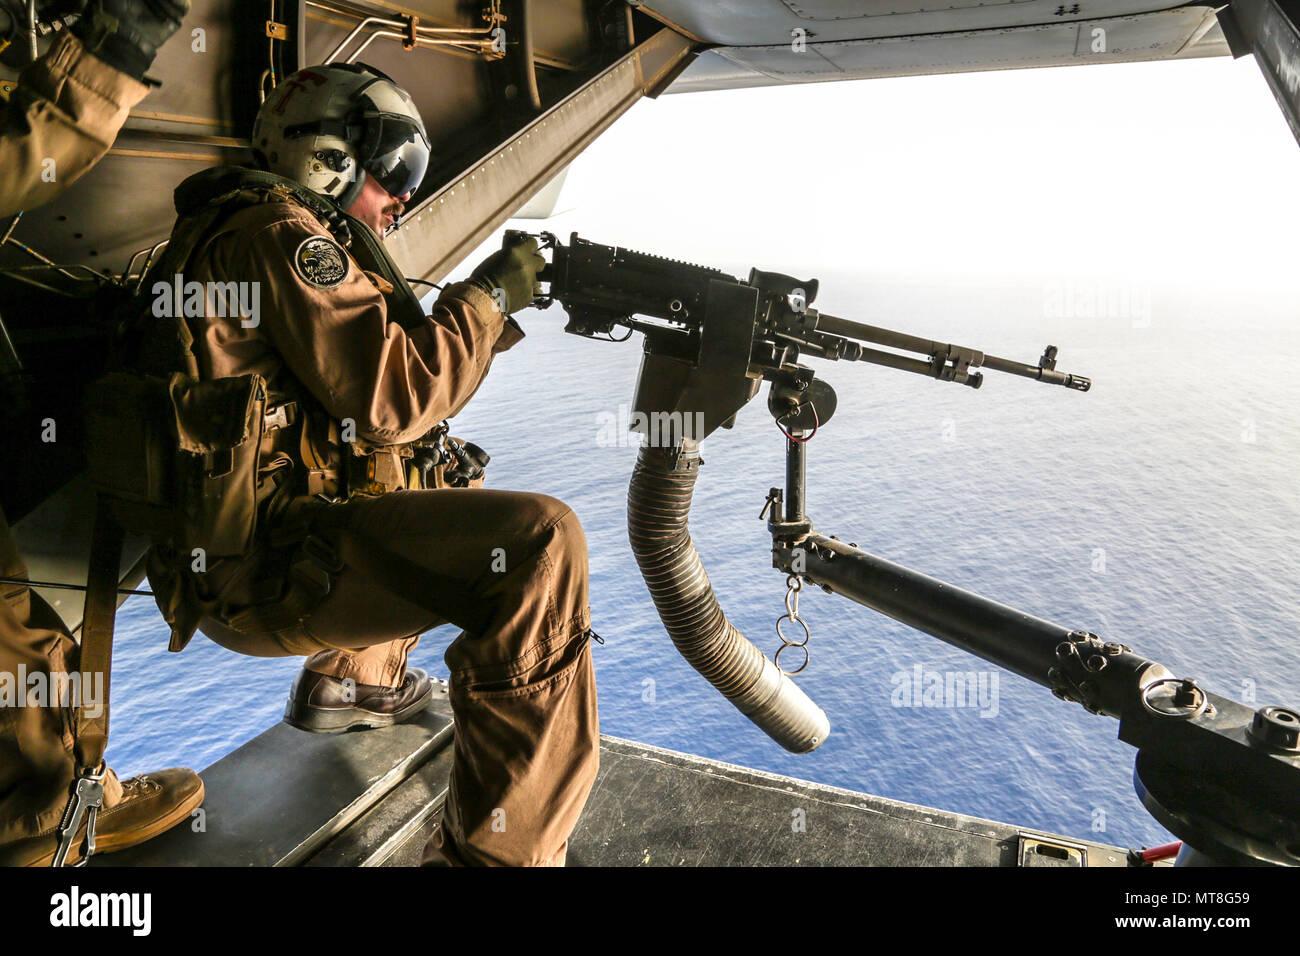 5th Fleet Area Of Operations May 11 2018 Us Marine Corps Staff